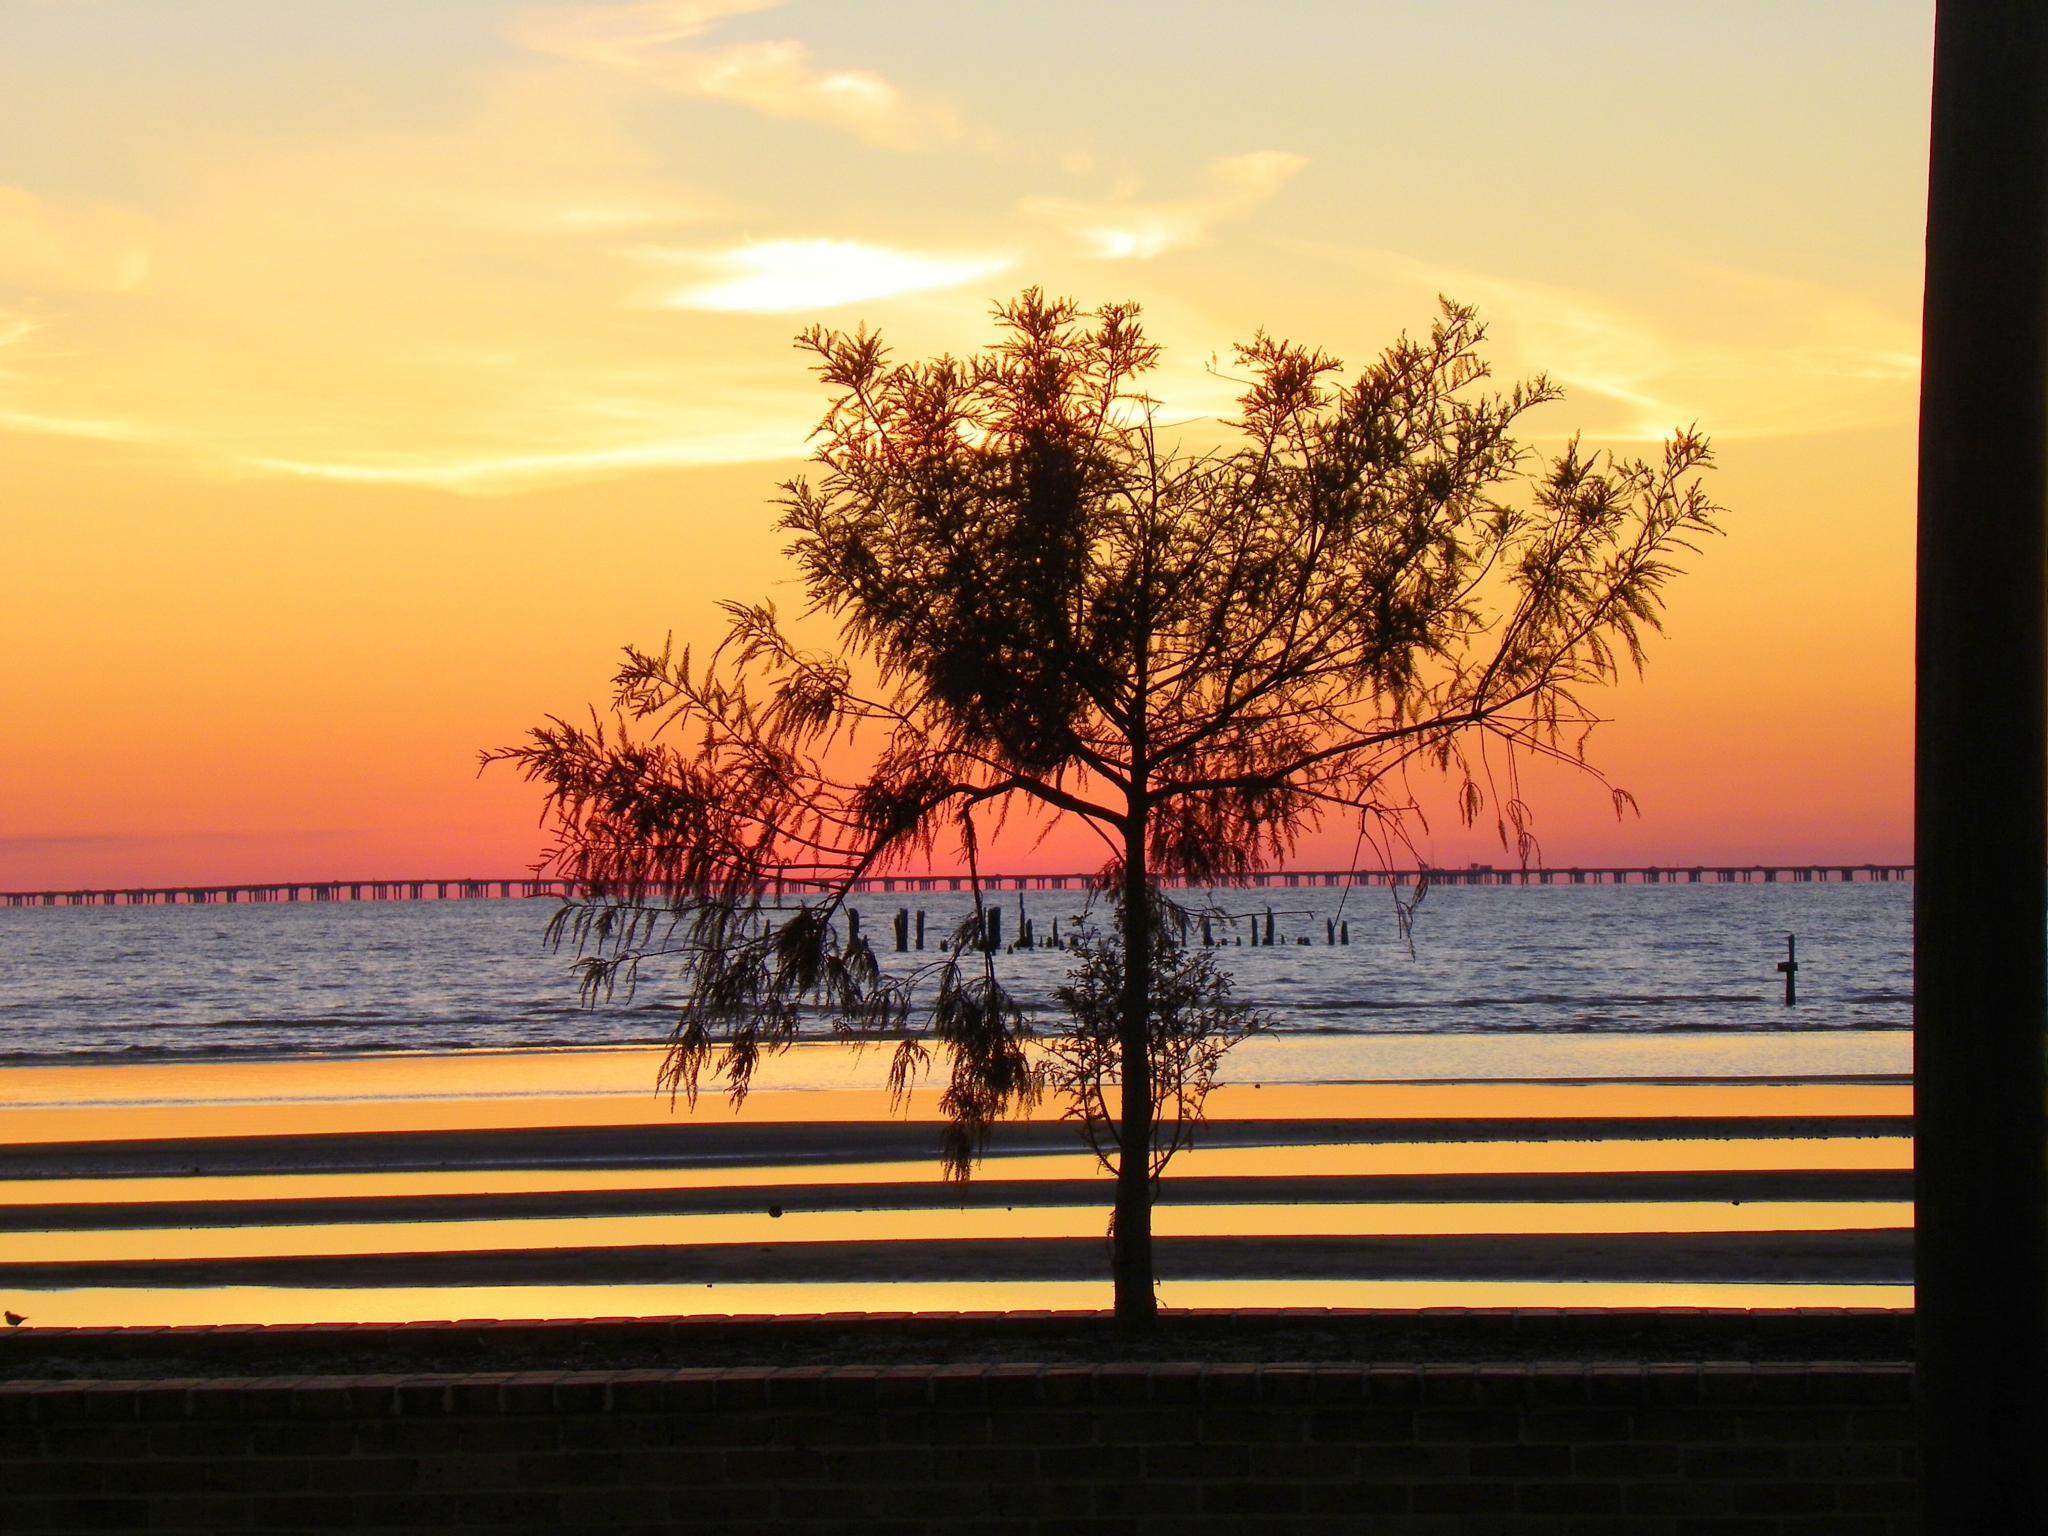 Sunset On Lake Ponchatrain by TeriF